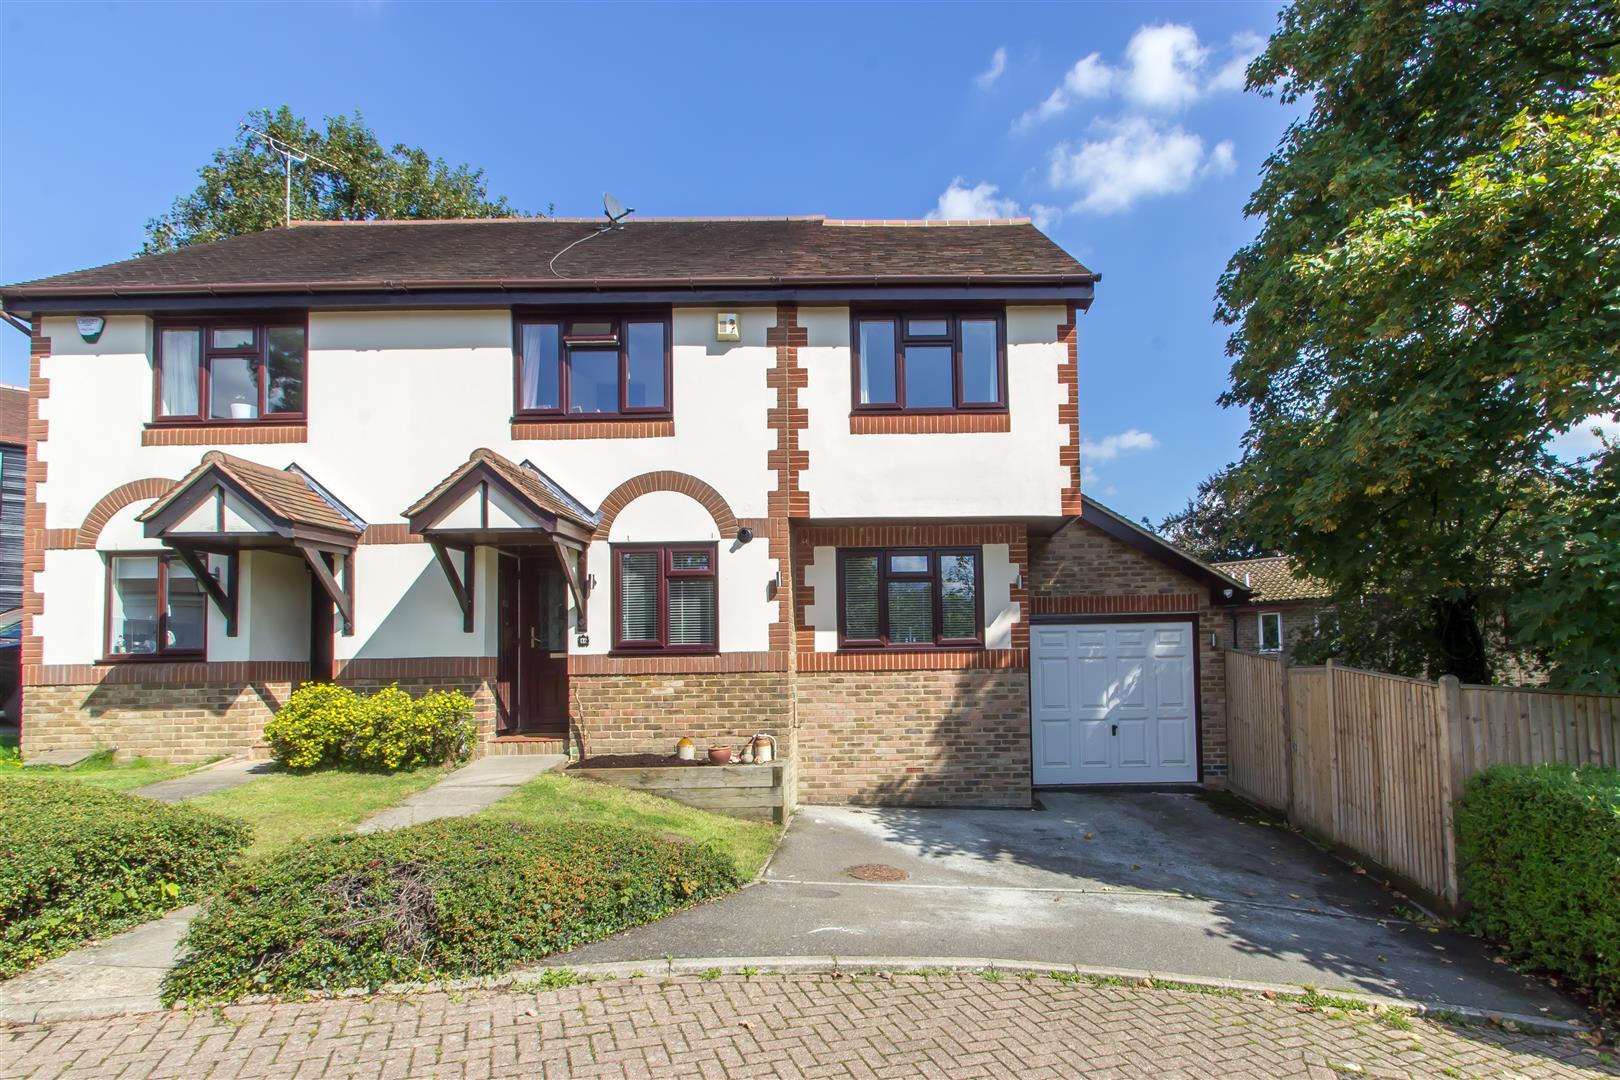 3 Bedrooms Semi Detached House for sale in Black Eagle Close, Westerham